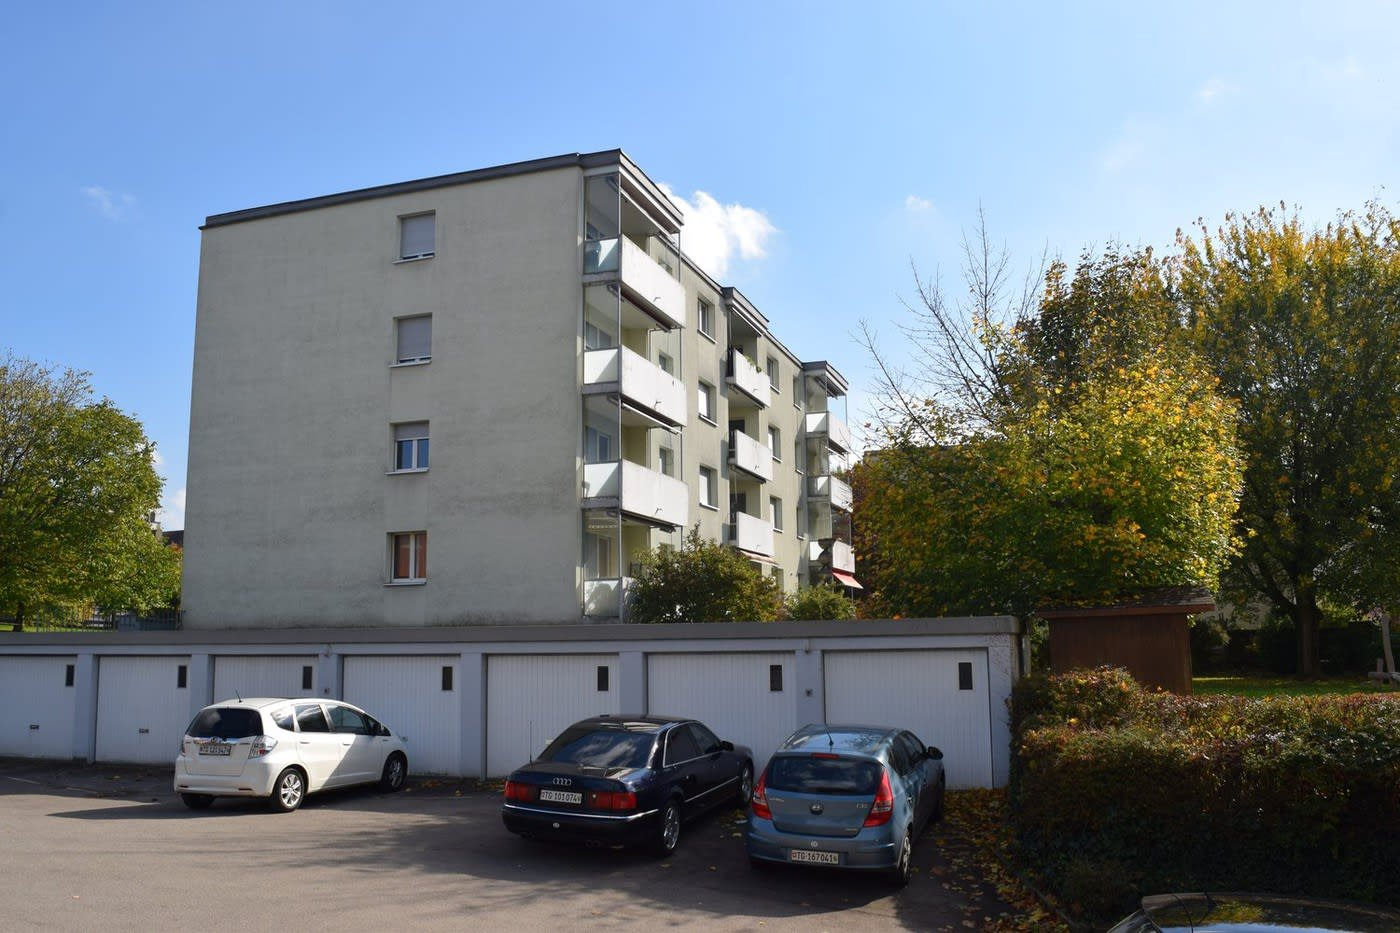 Bühlstrasse 5